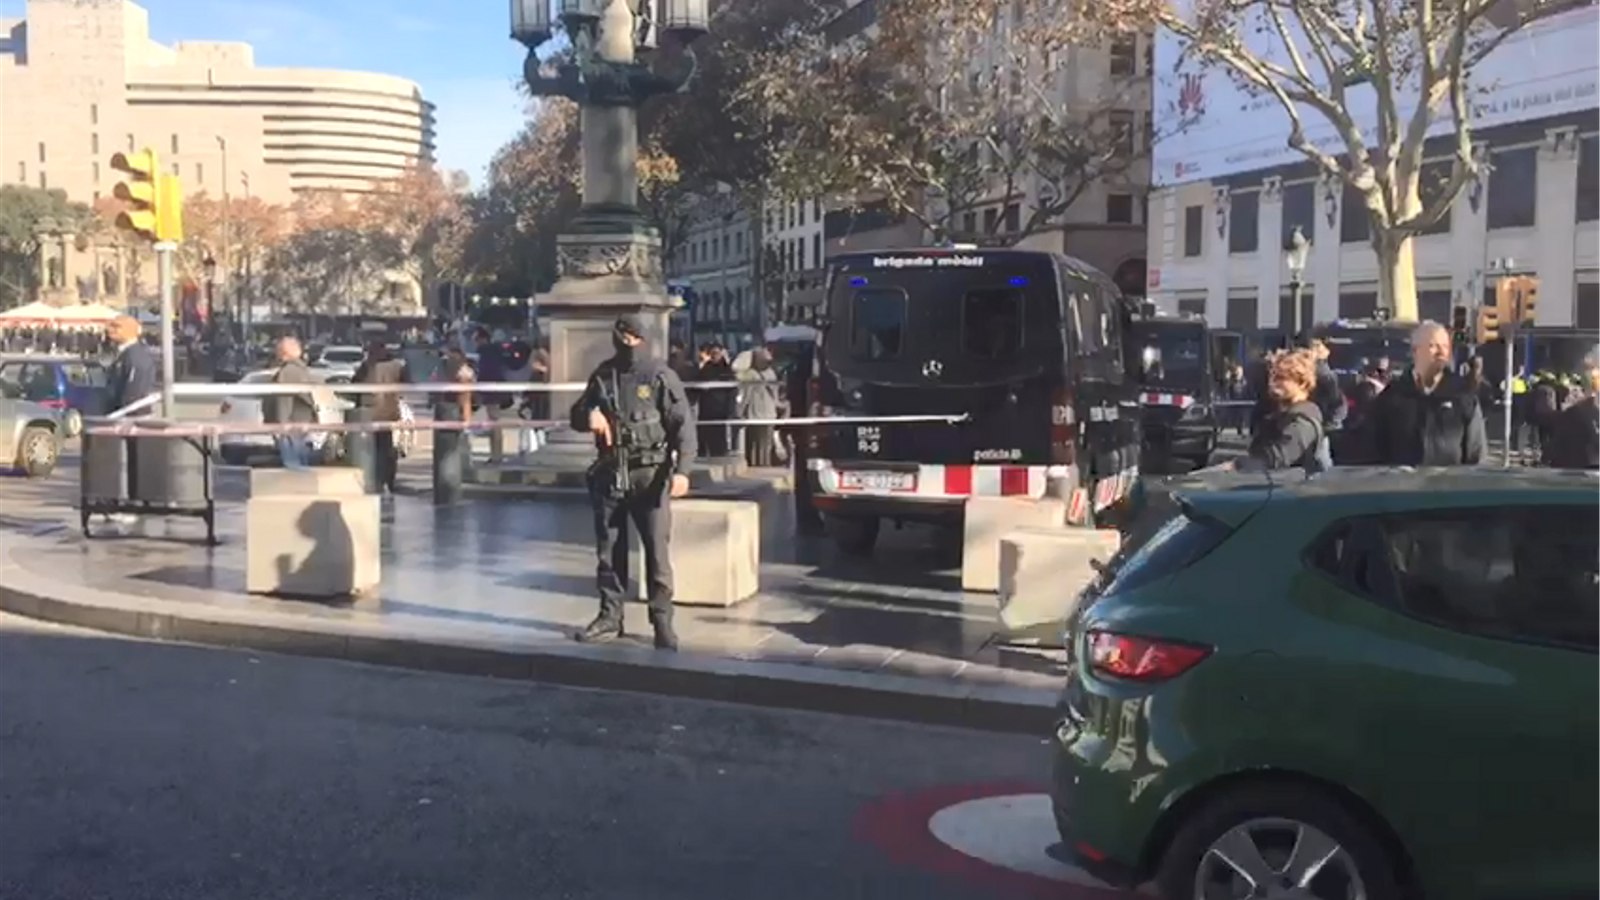 Reforcen la vigilància al centre de Barcelona per l'amenaça terrorista